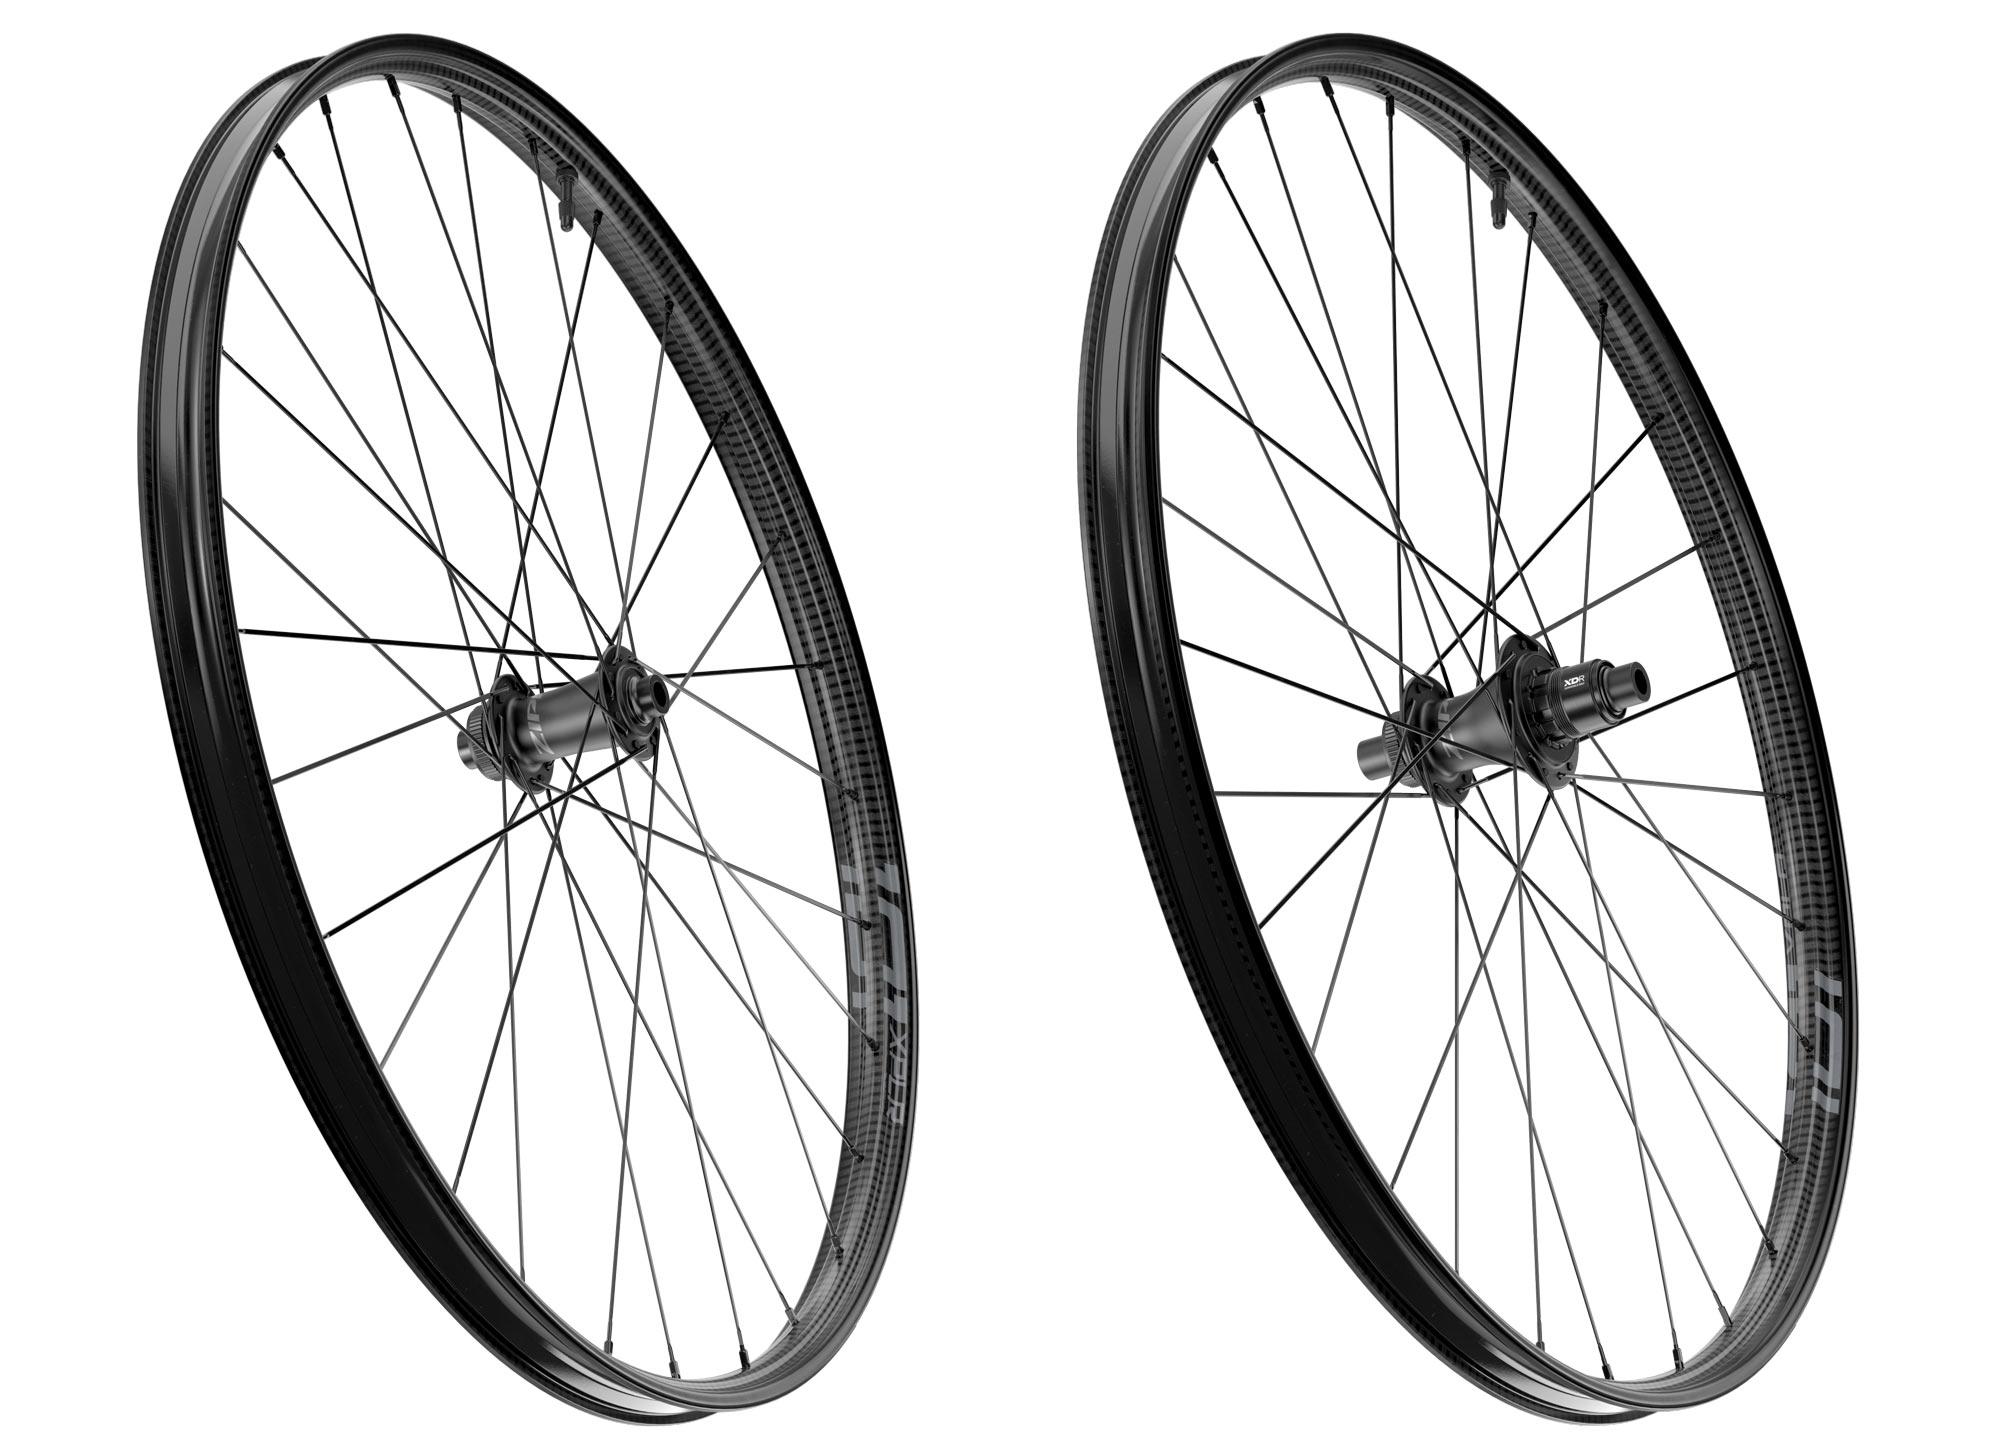 zipp 101 xplr gravel bike wheels studio shot showing front and rear